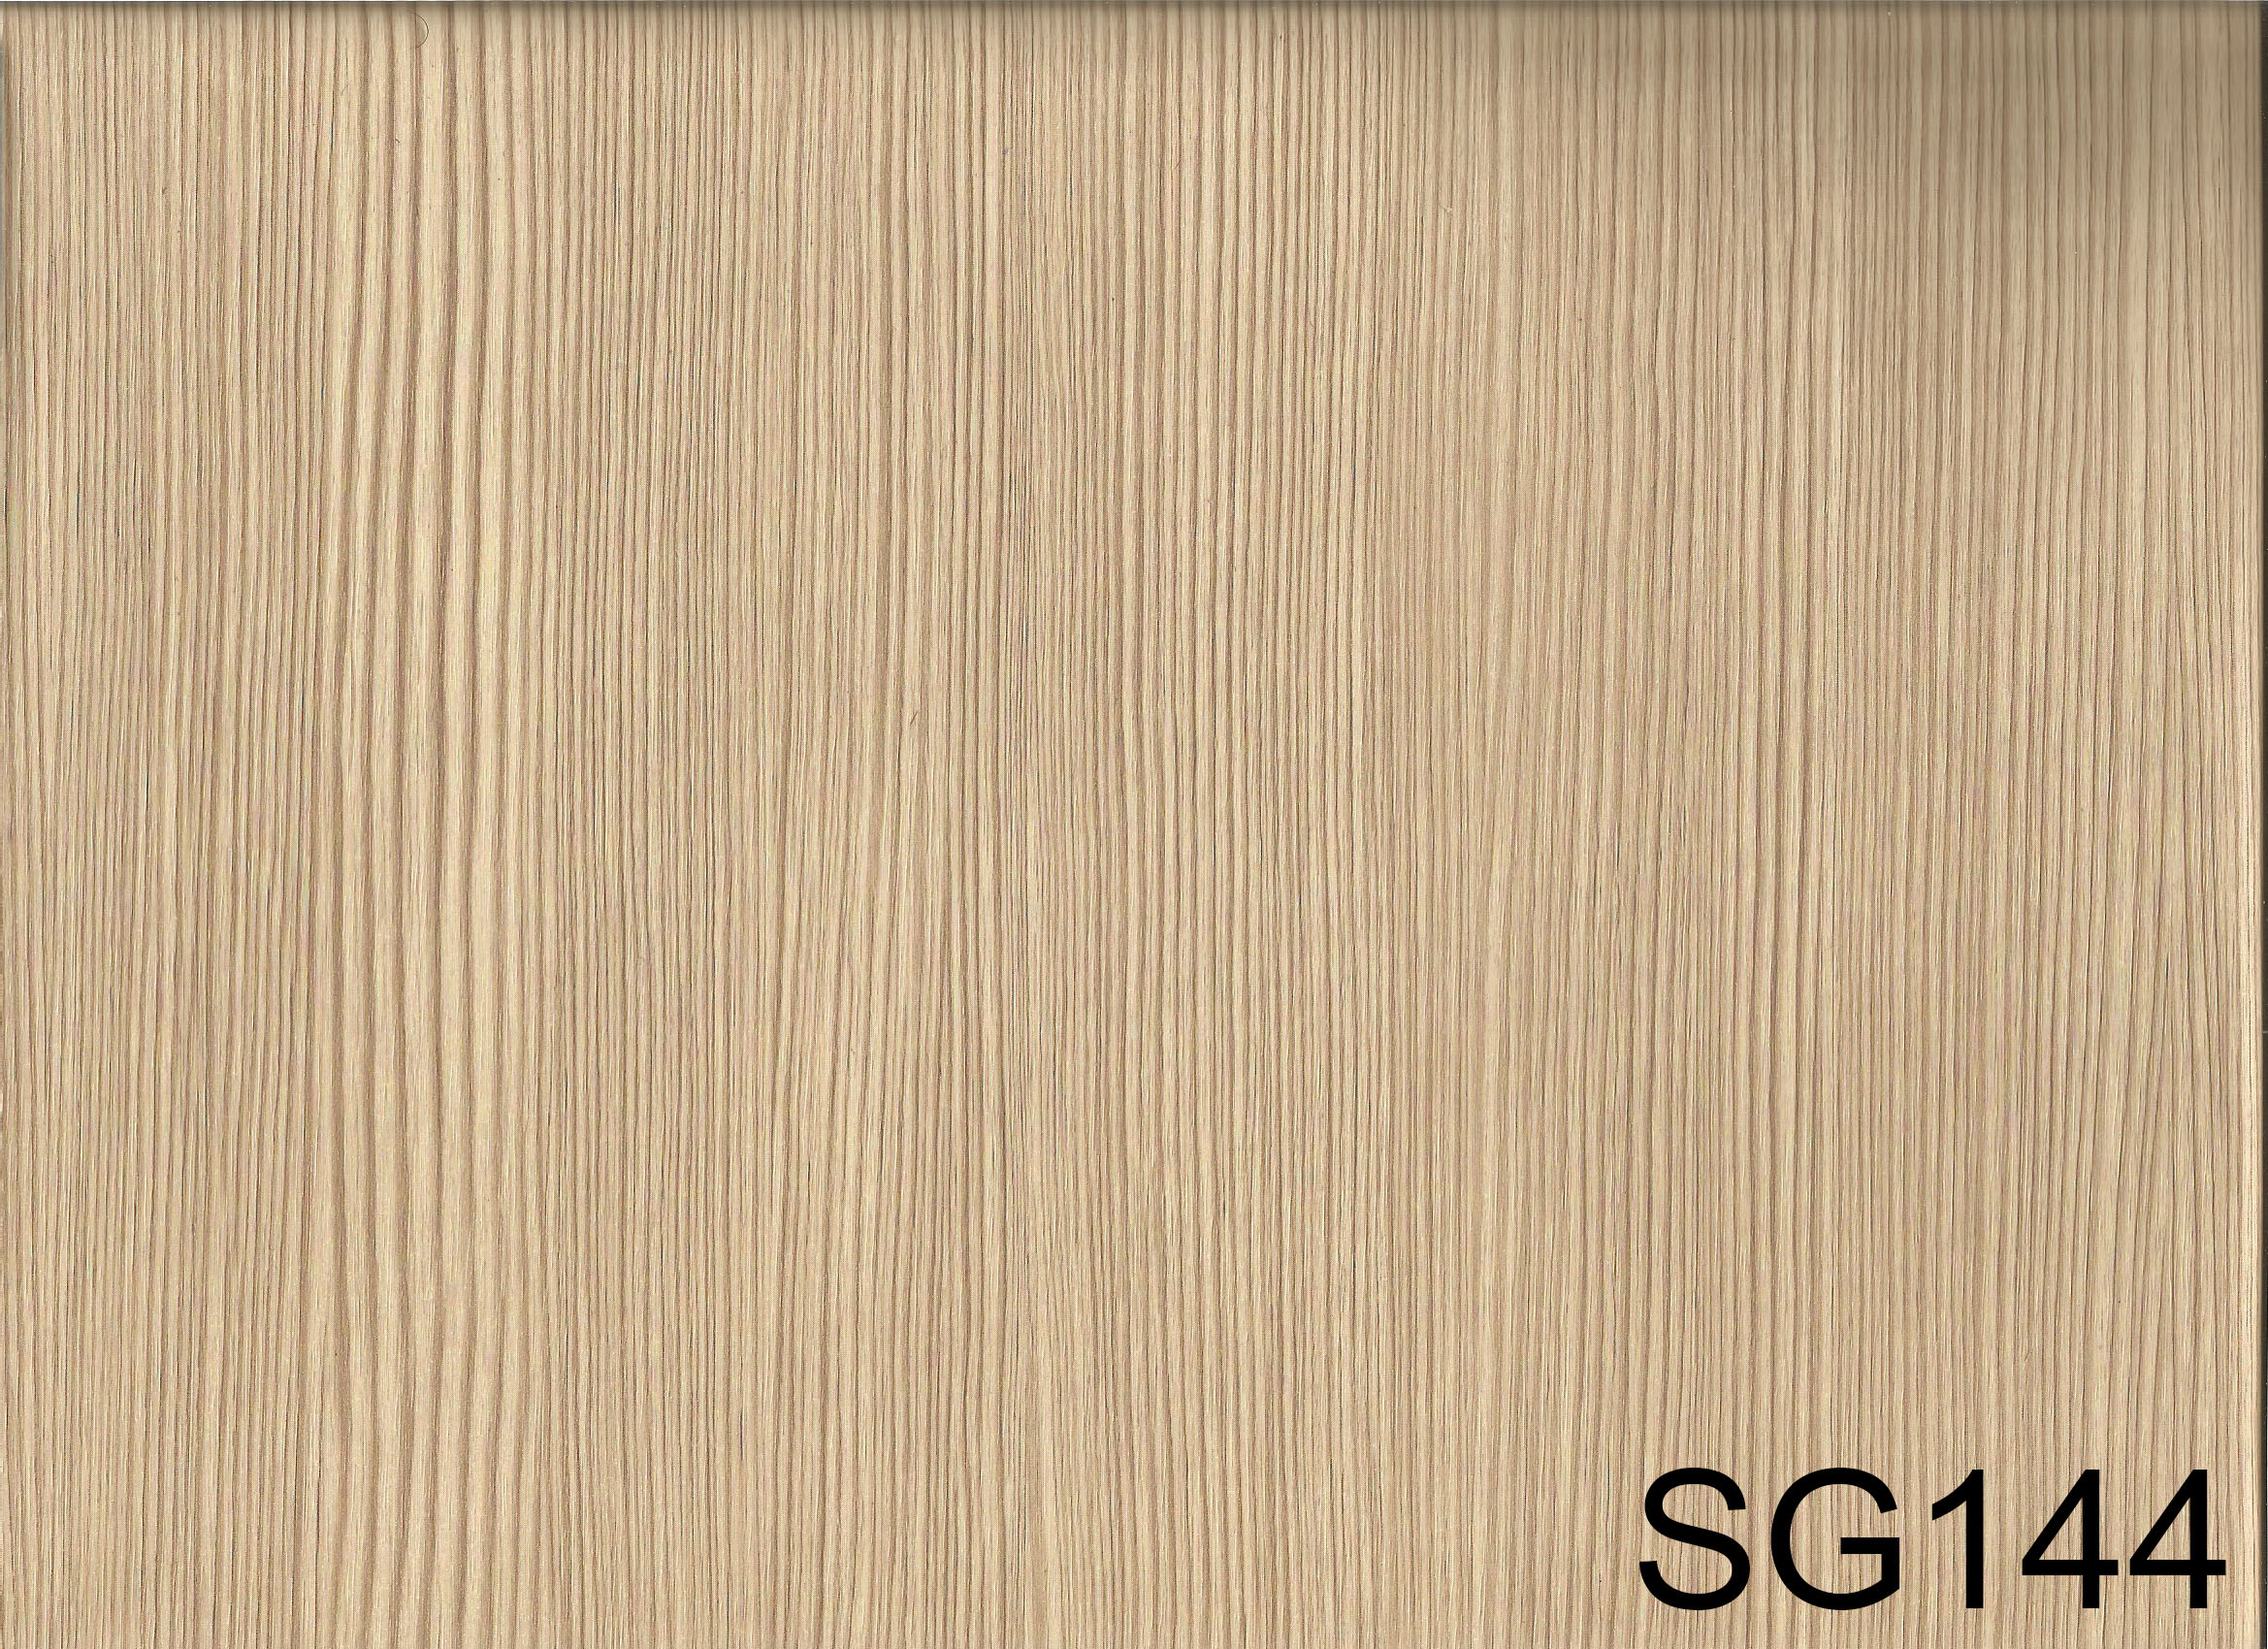 SG144